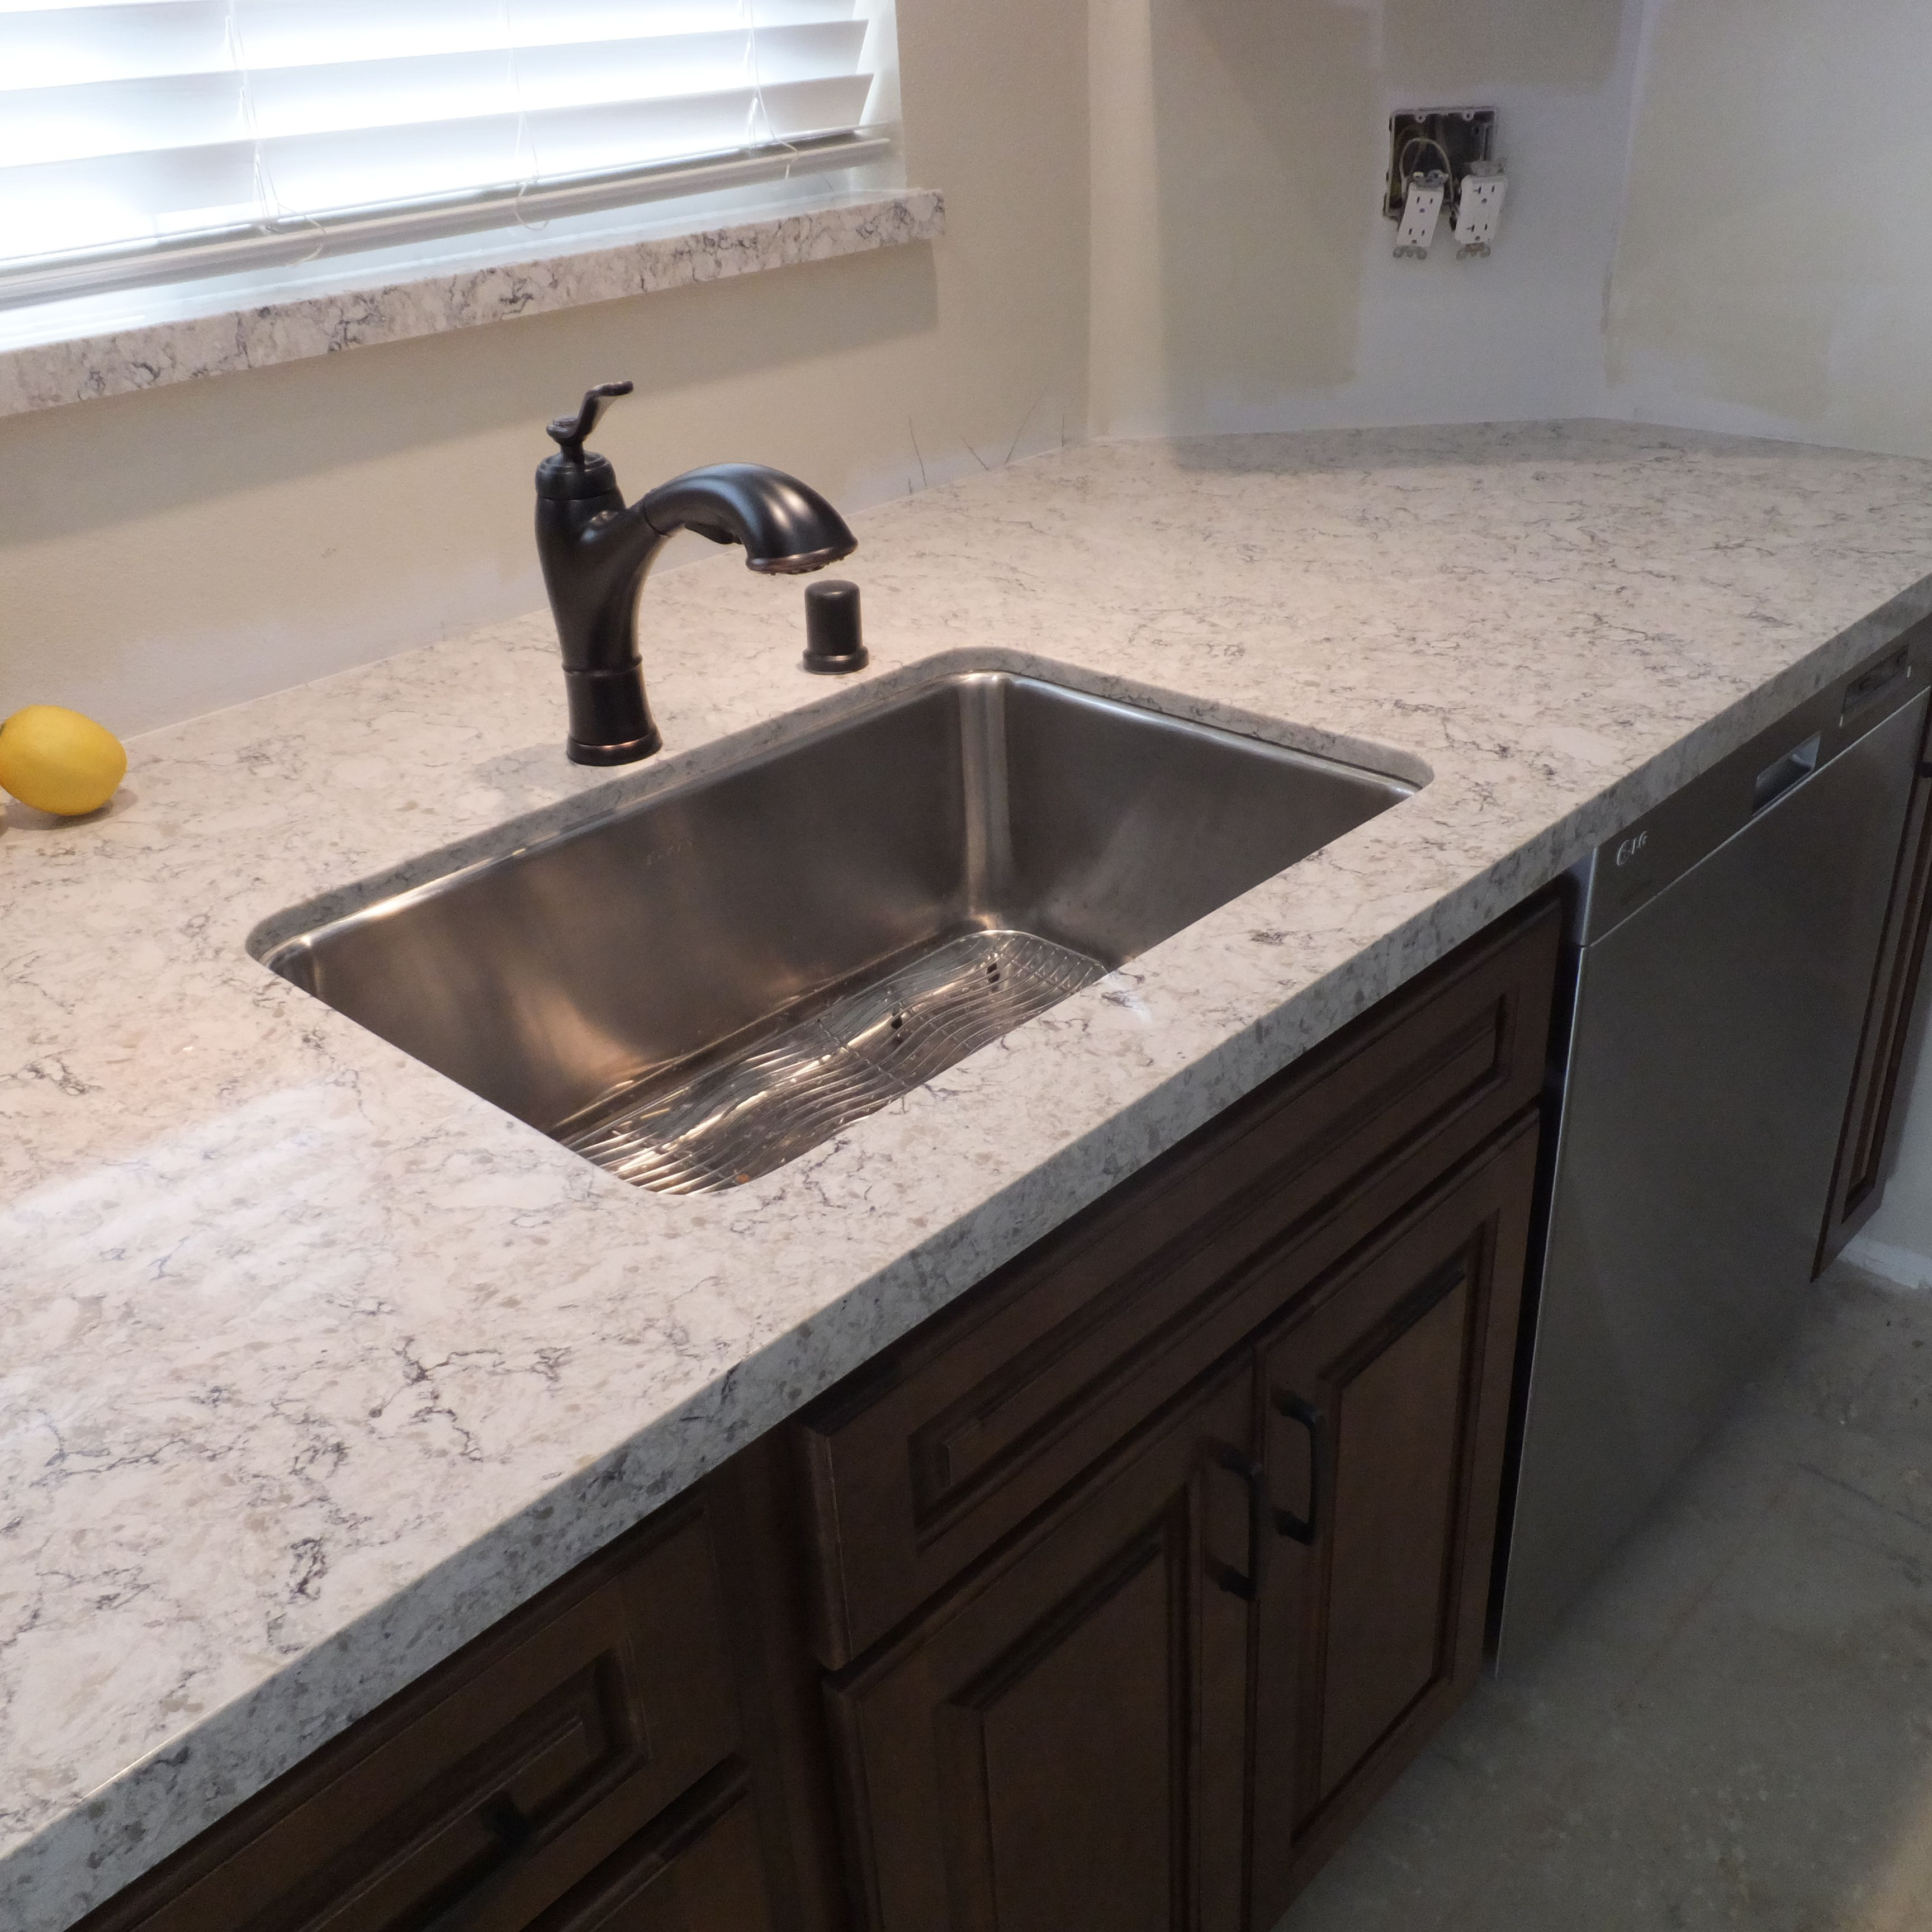 LG Viatera Quartz Aria - Clean Cut Stone, West Hills CA   Kitchen ...